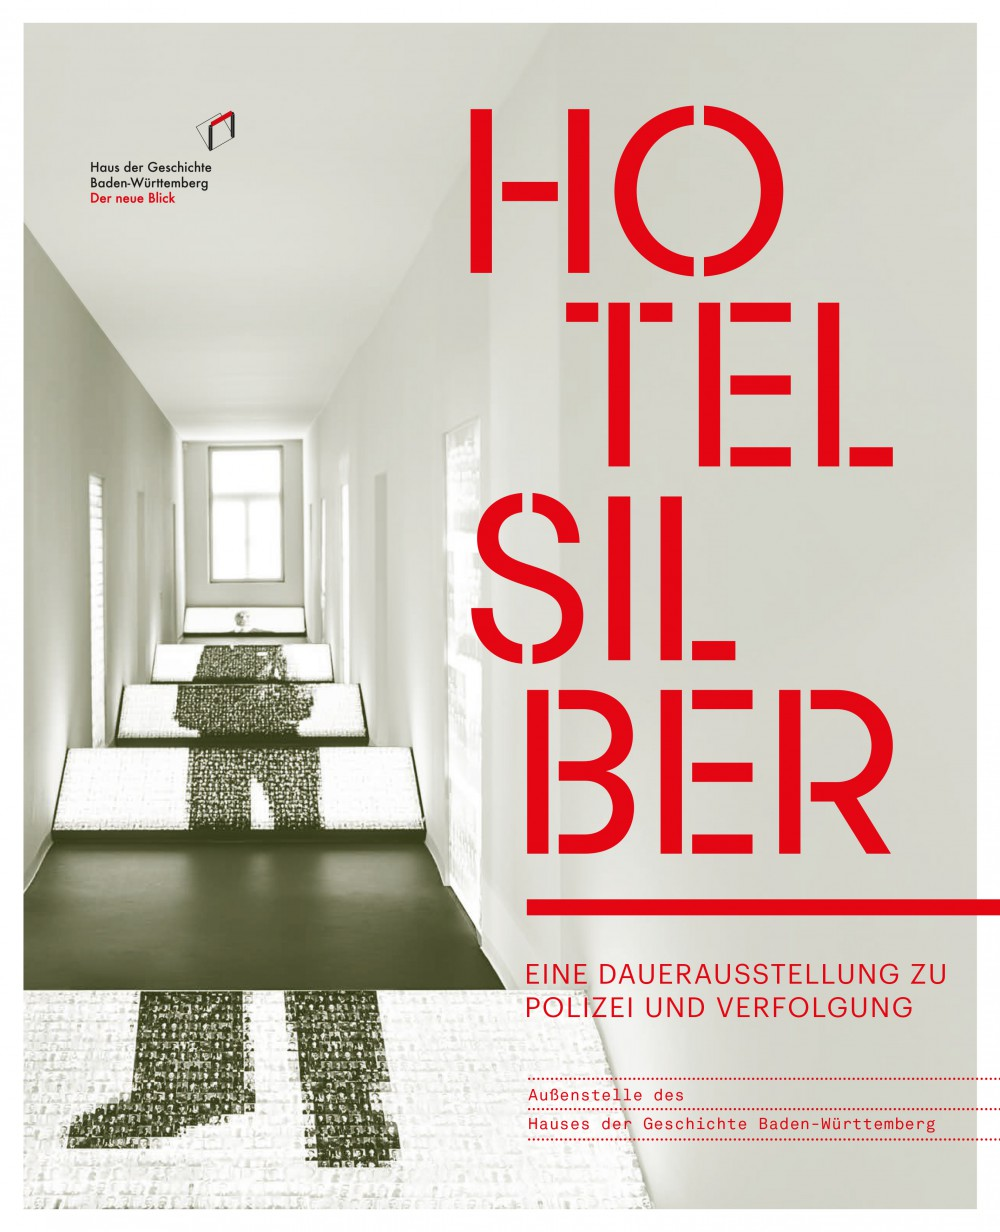 katalog-hotel-silber_umschlag-VS